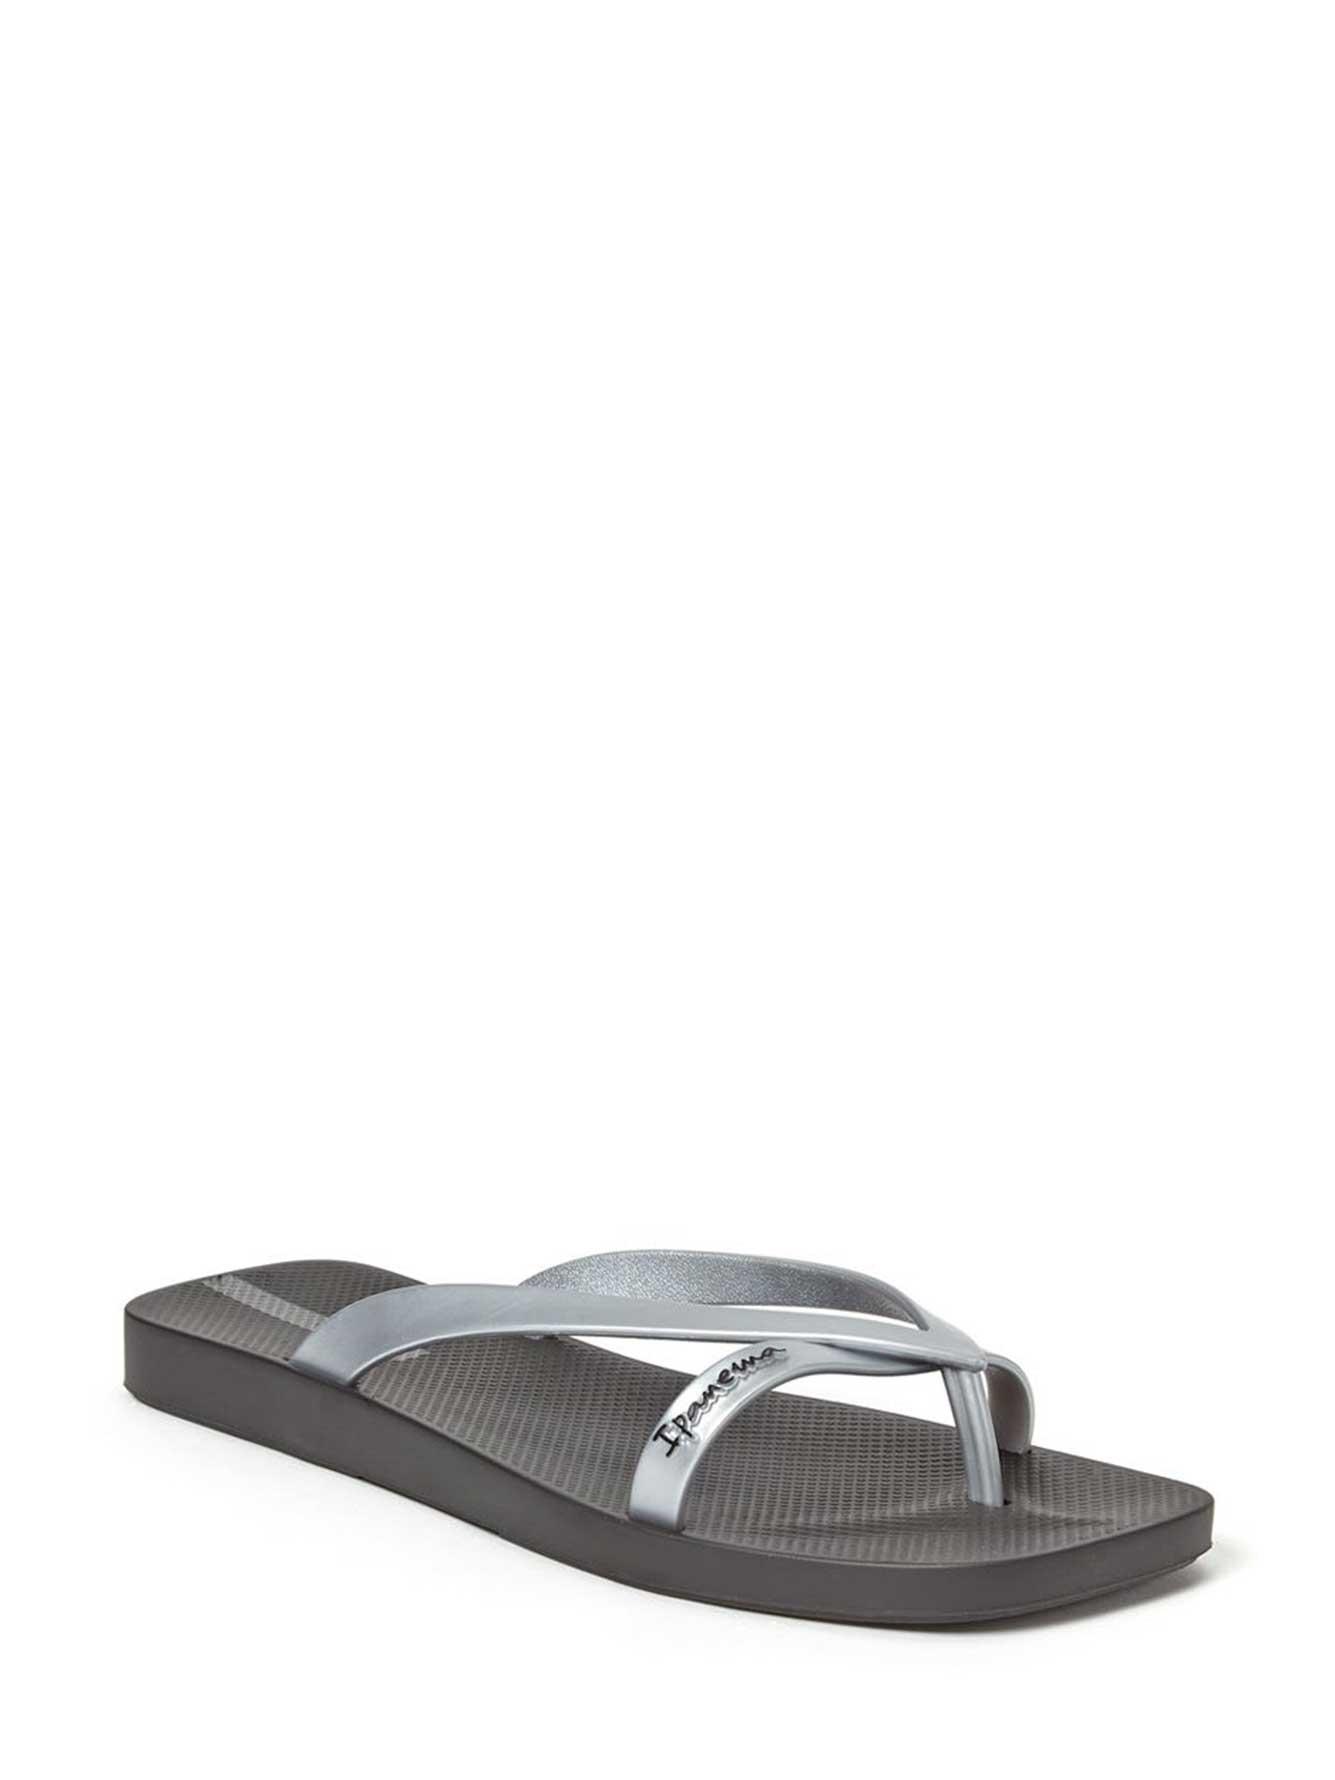 b3049fde3459 Ipanema Kirey Double Strap Flip Flops